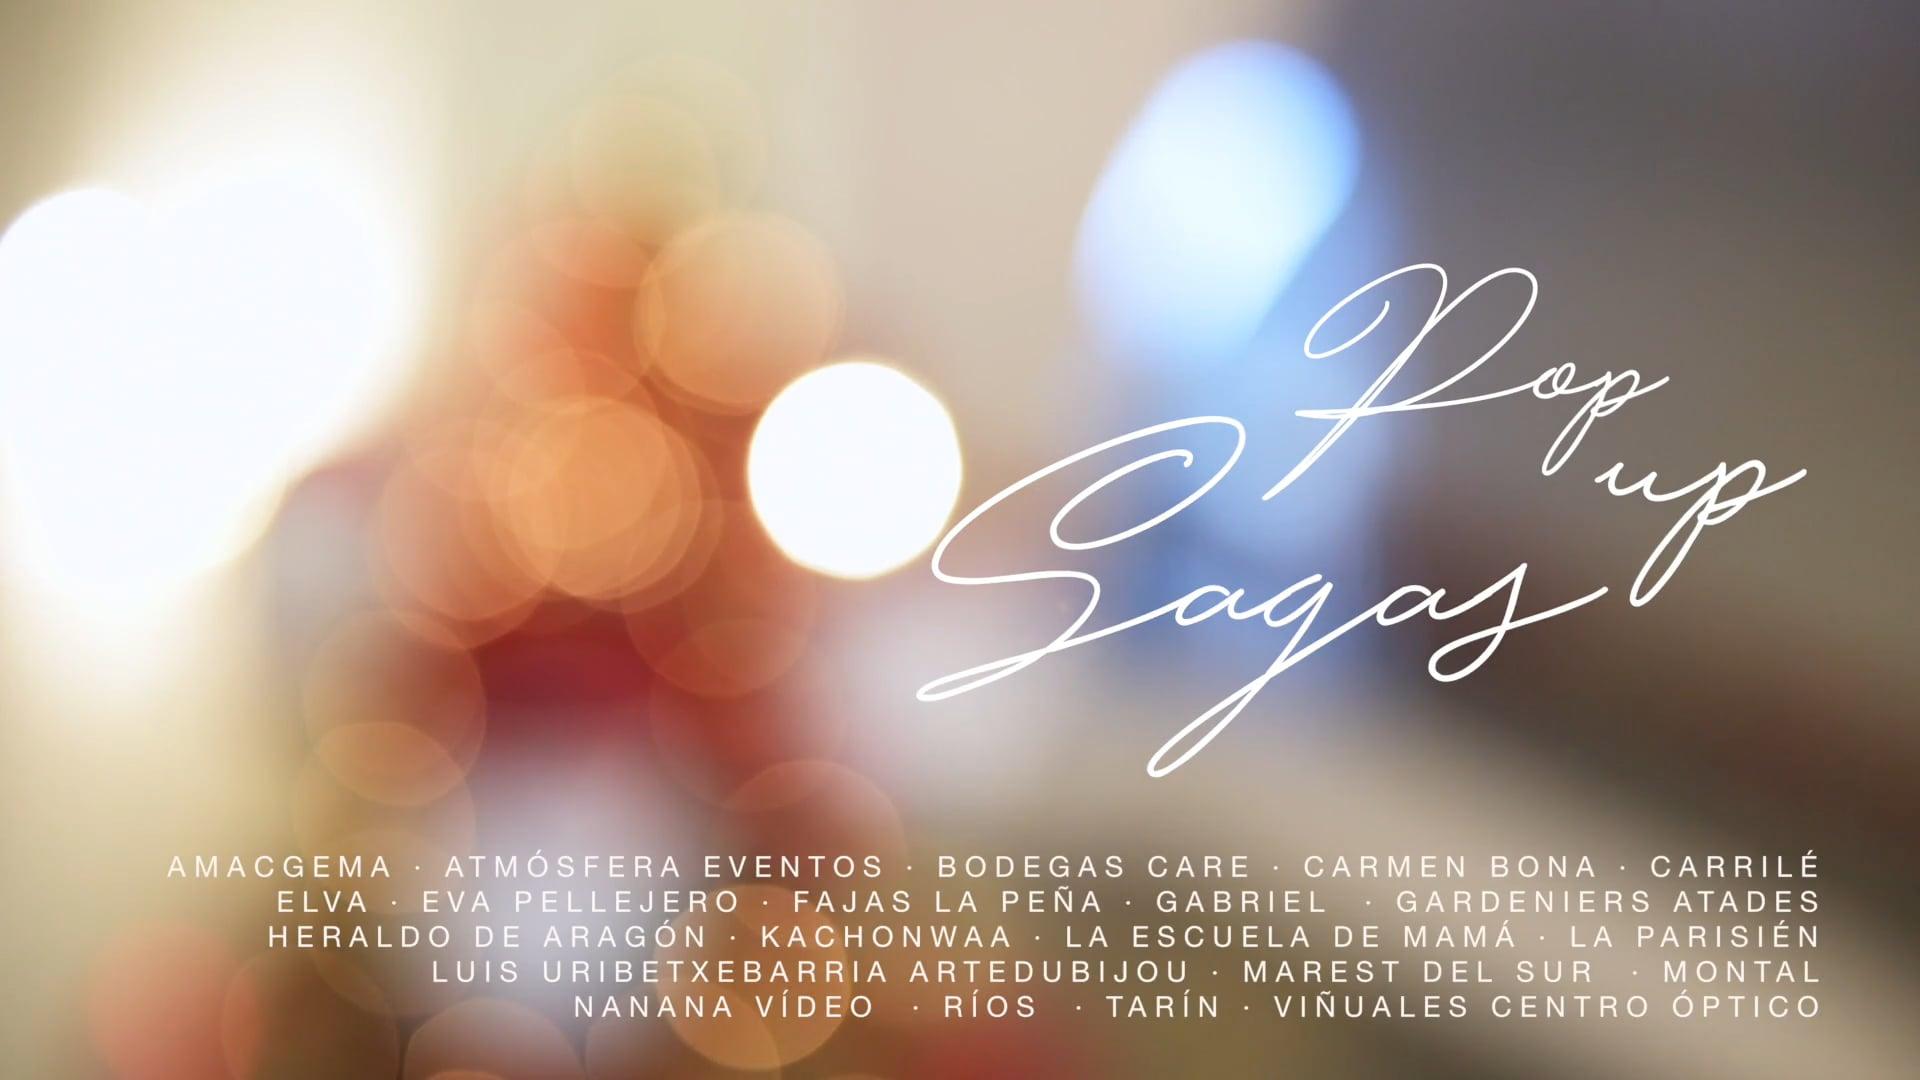 PopUpSagas Zaragoza - vídeo de NANANAVIDEO - pop up sagas